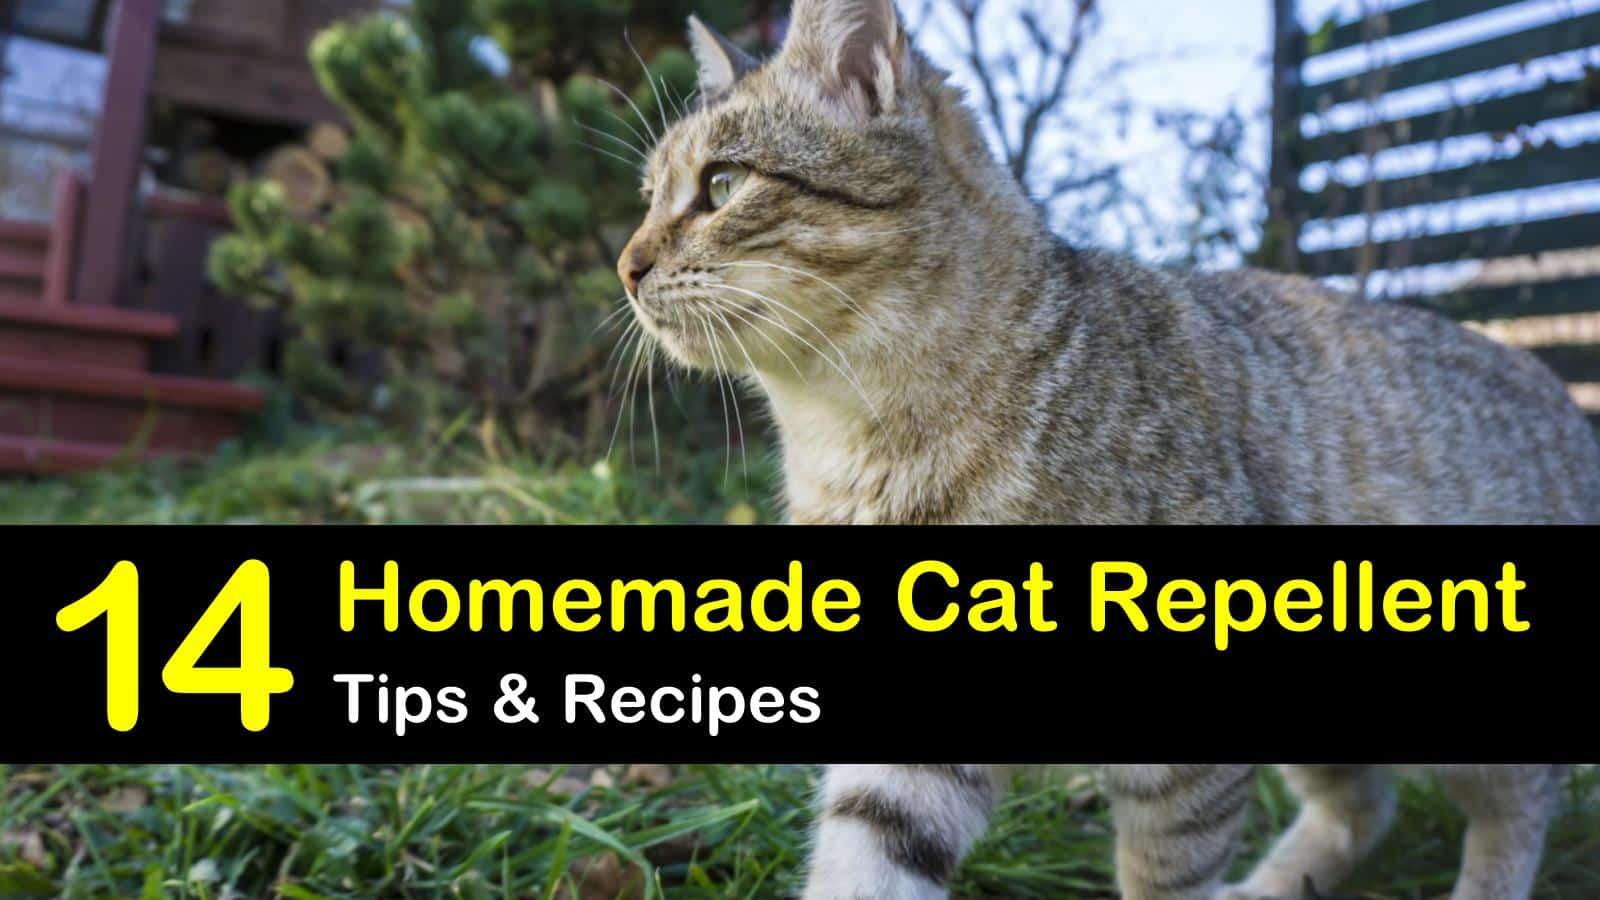 homemade cat repellent titleimg1